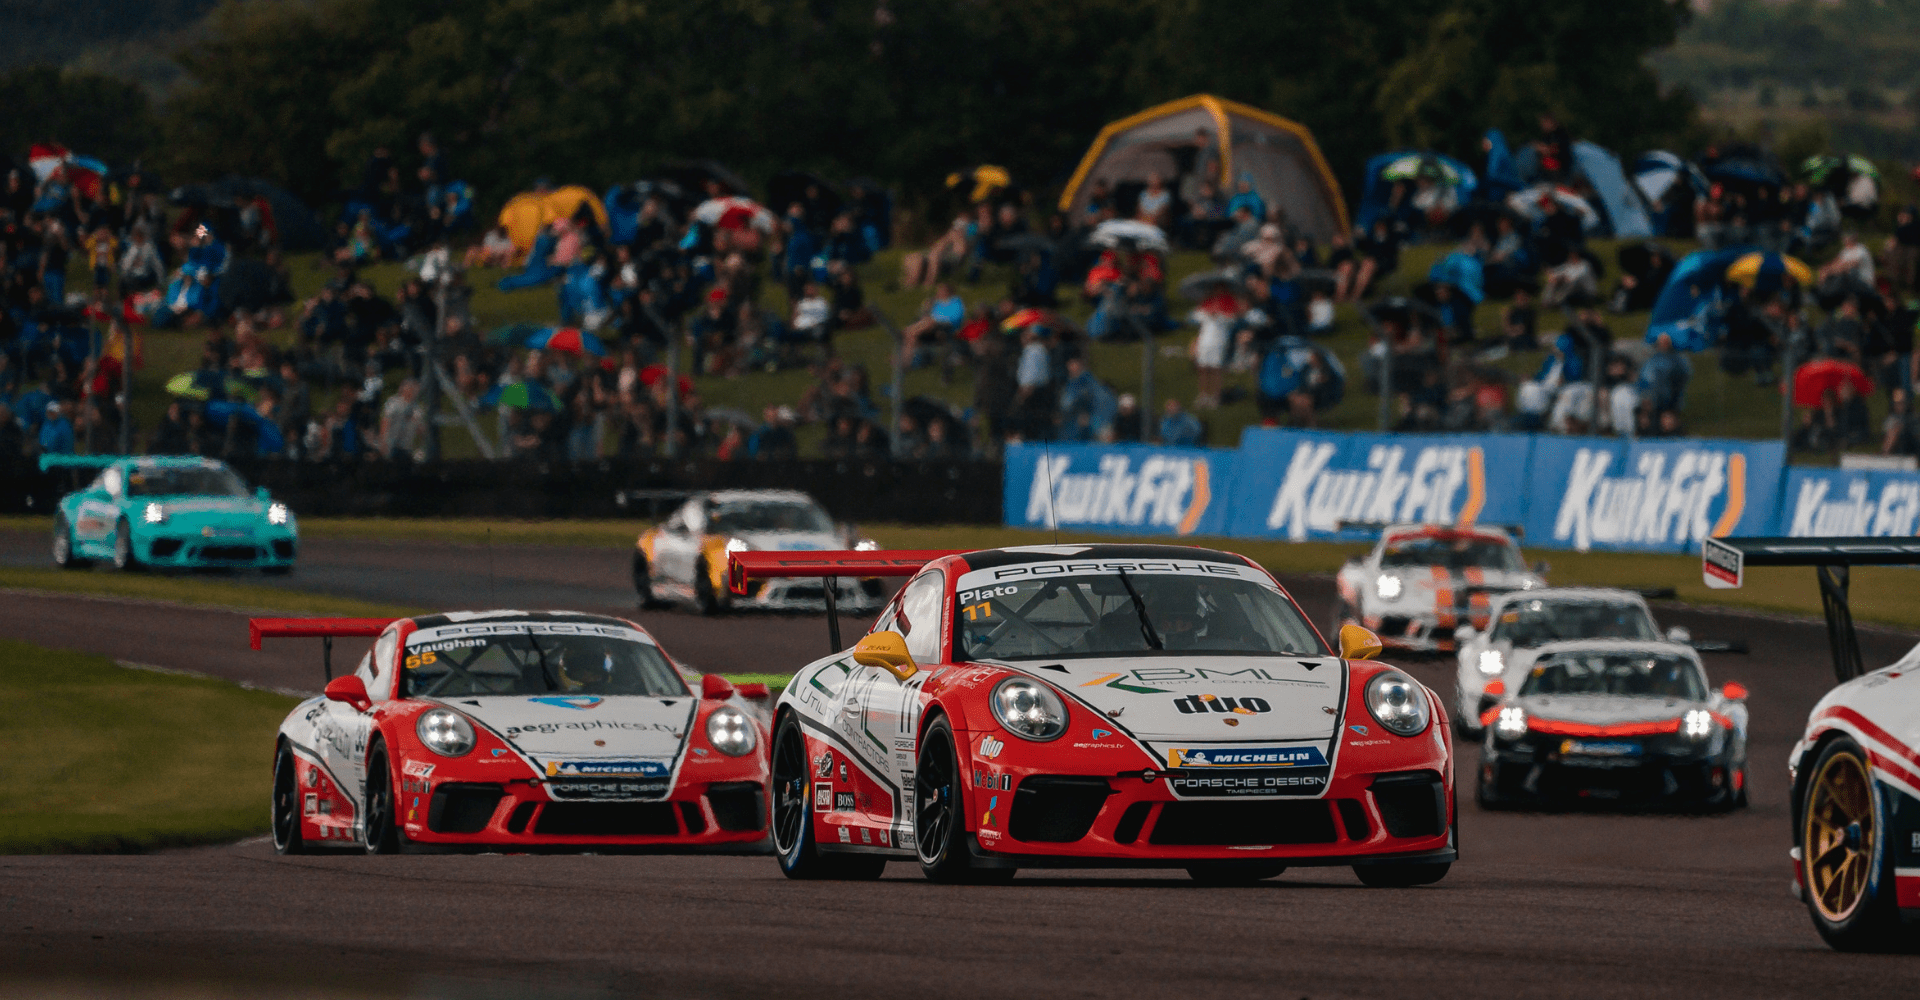 Motorbase Performance digs deep for podium finish at Thruxton